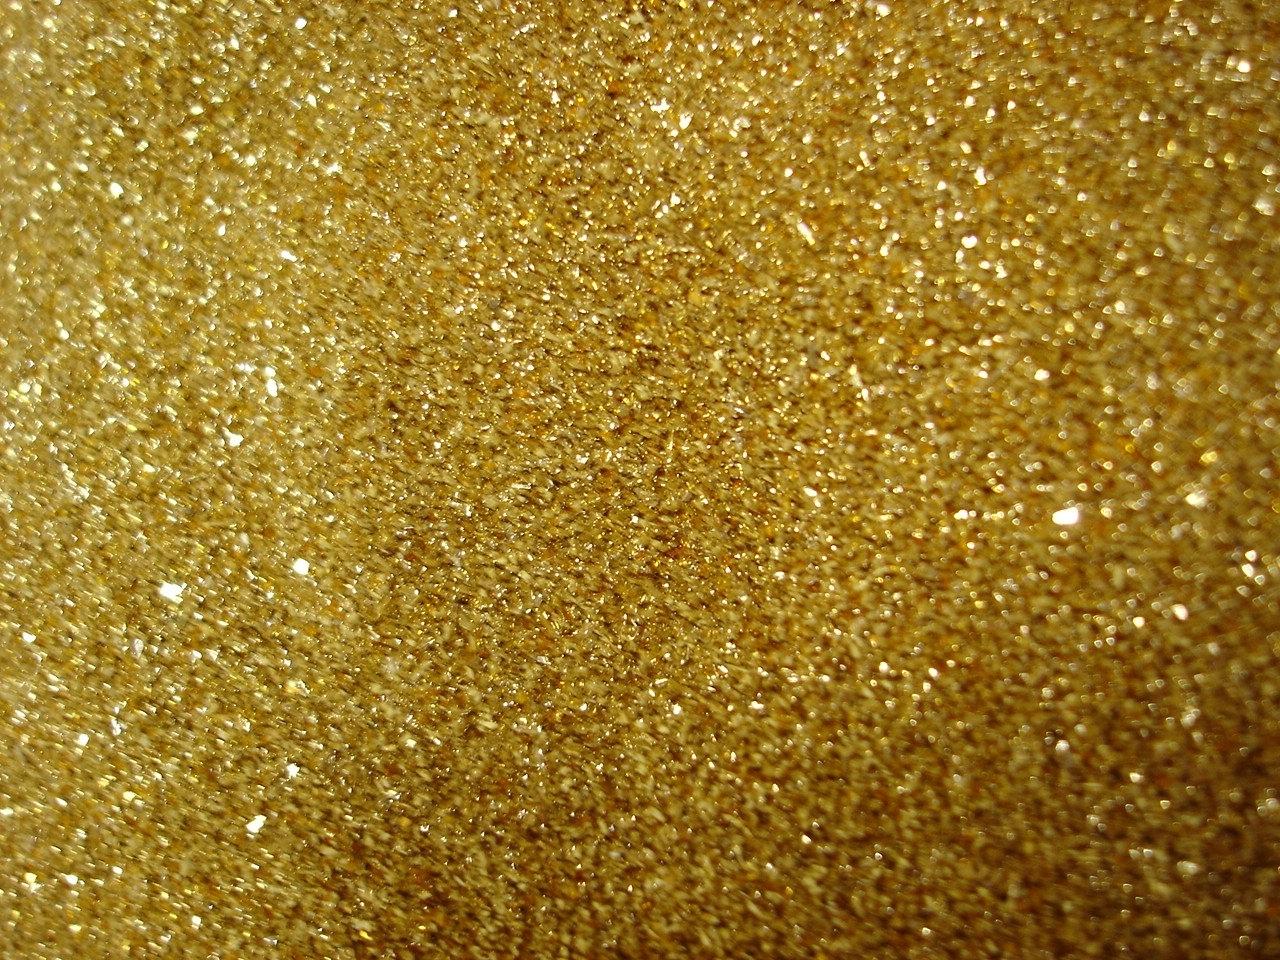 Title : black and gold wallpaper tumblr 7 free hd wallpaper. Dimension : 1280 x 960. File Type : JPG/JPEG